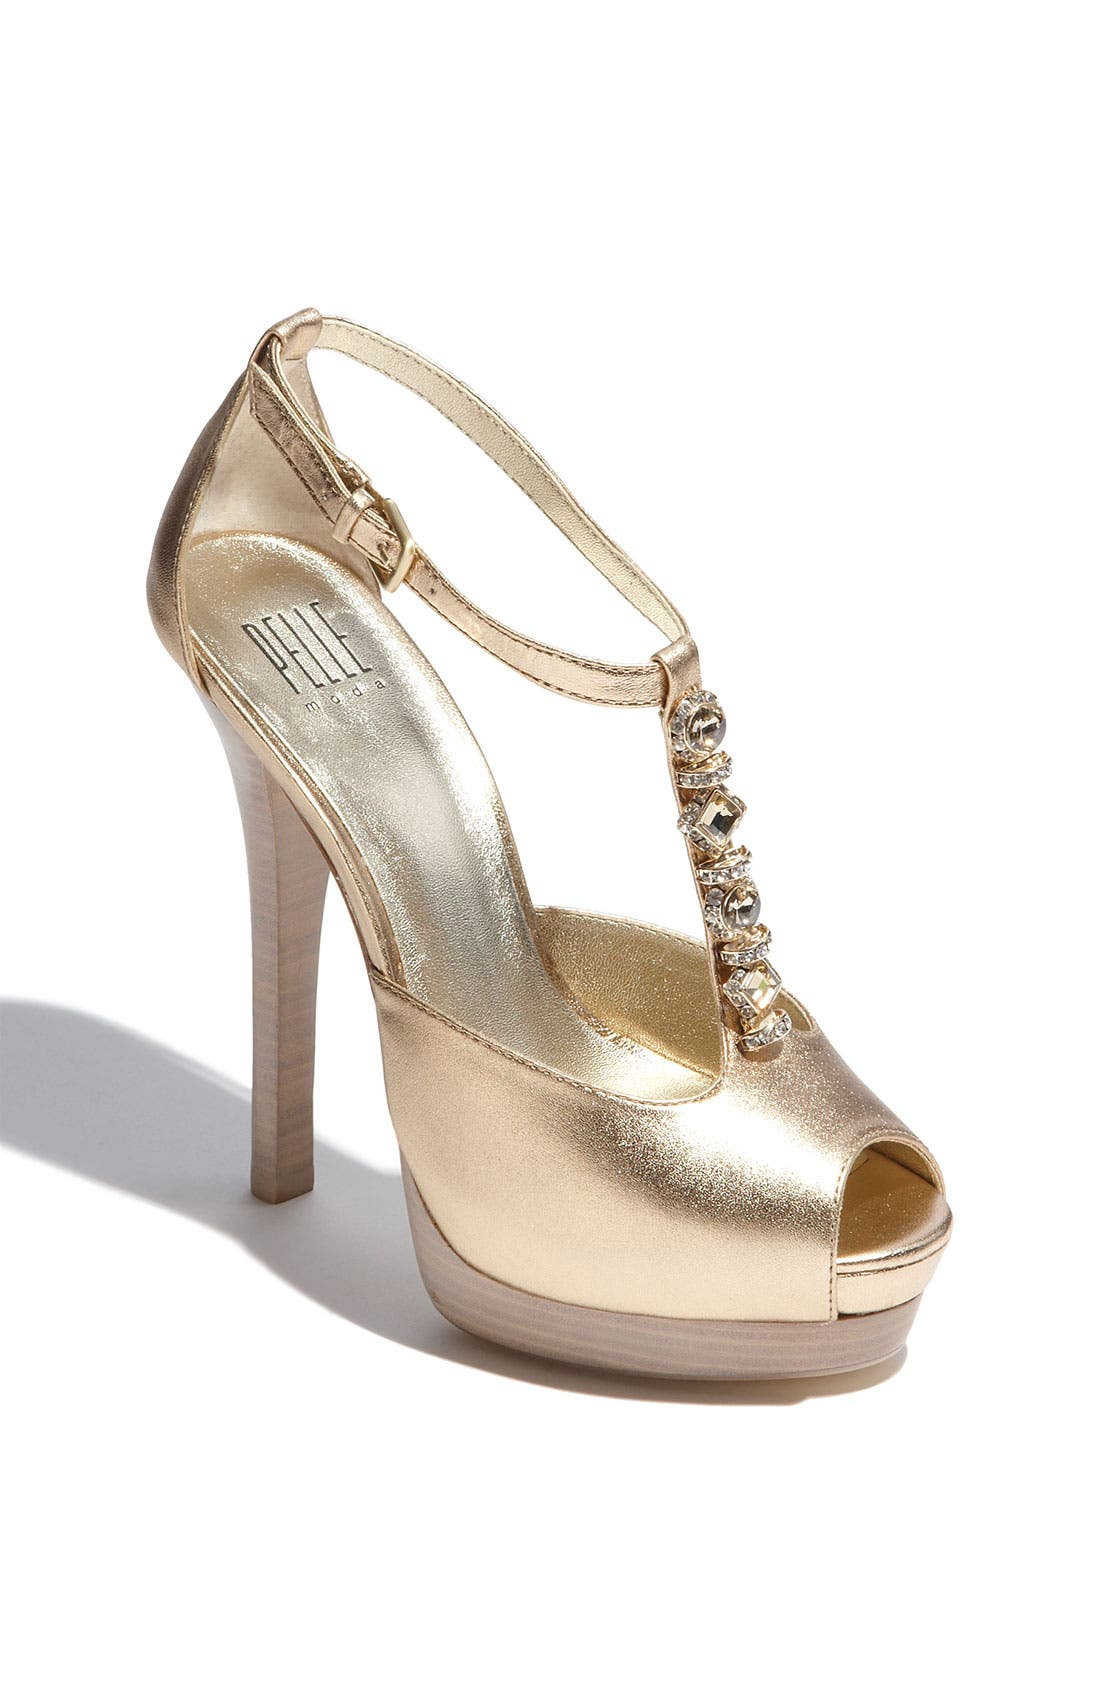 Main Image - Pelle Moda 'Rae' Platform Sandal